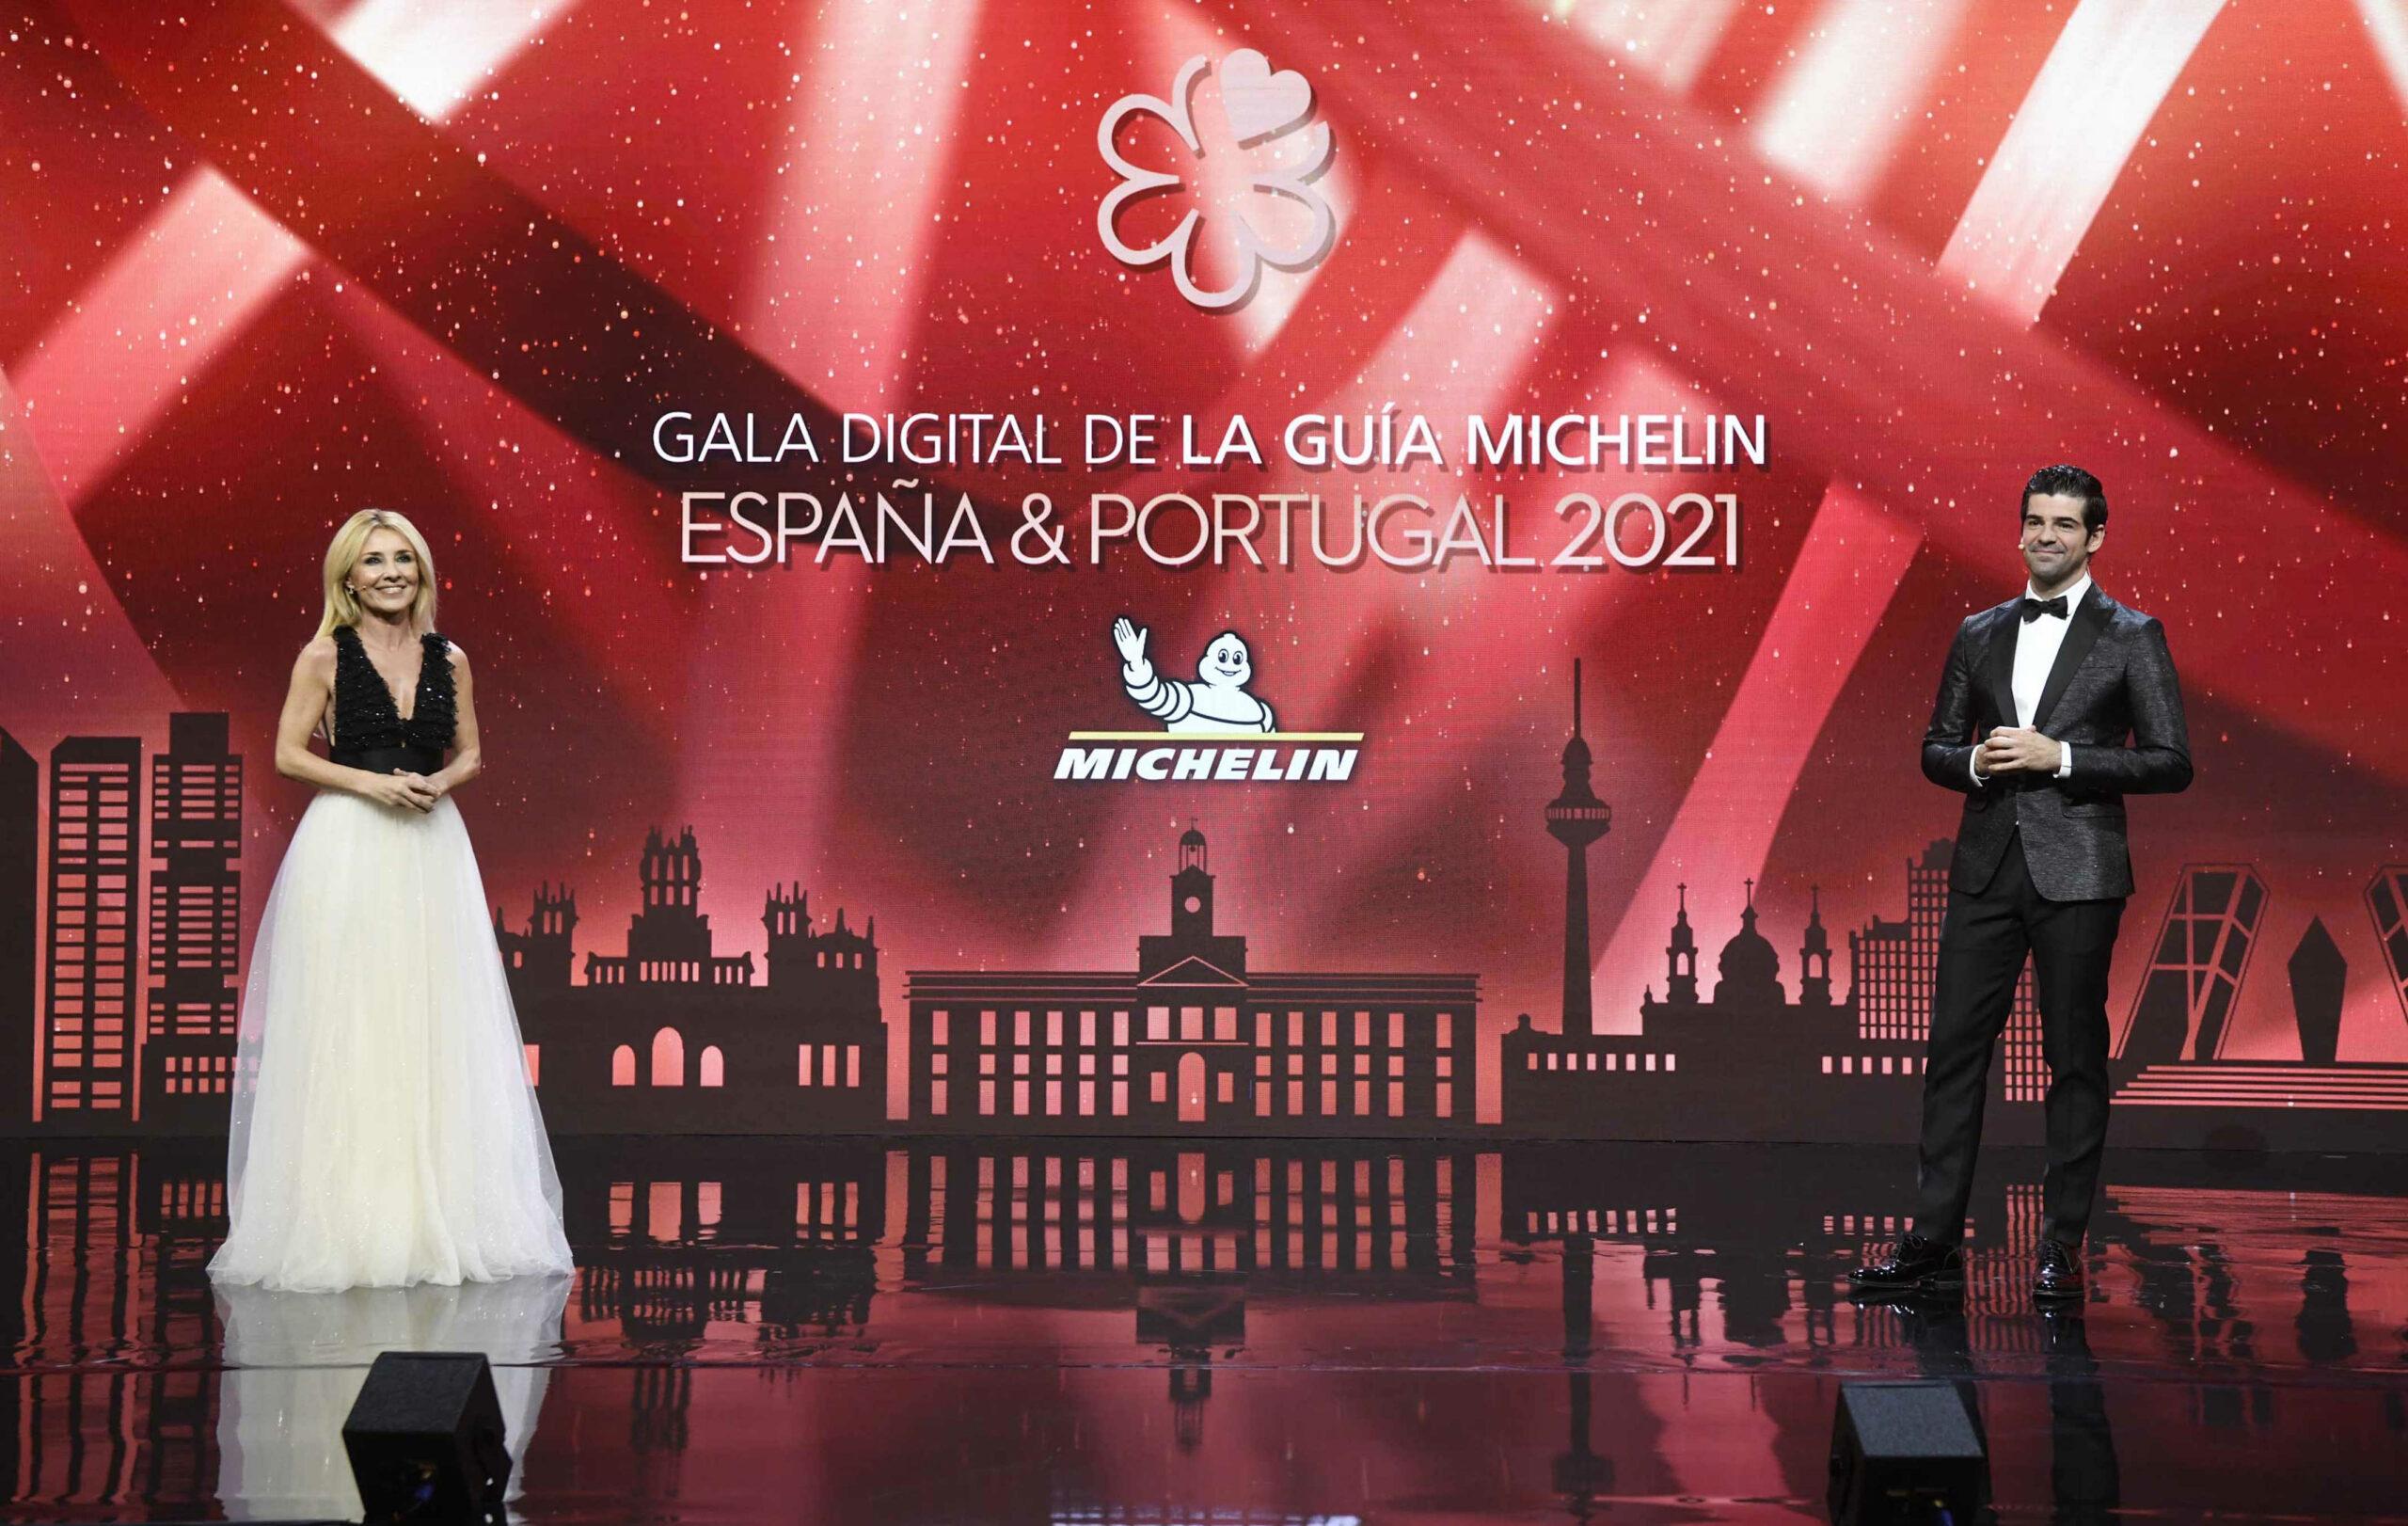 Gala de la Guia Michelin amb Cayetana Guillén Cuervo i Miguel Ángel Muñoz a Madrid   ACN